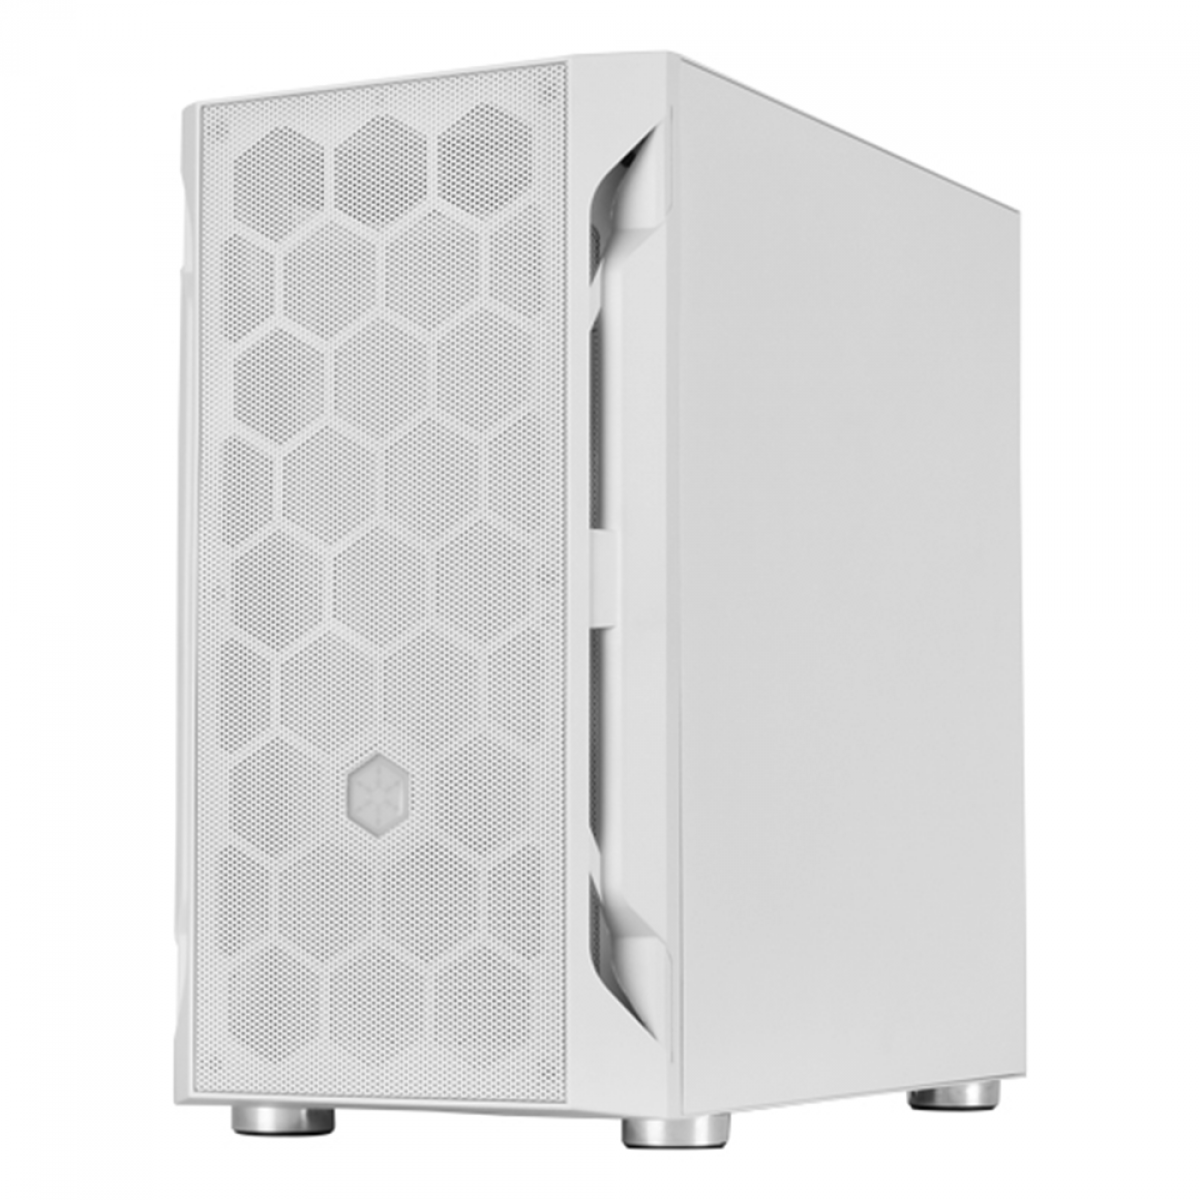 Gabinete Gamer SilverStone Fara H1M, Mini Tower, Vidro Temperado, White, Micro-ATX, Sem Fonte, Com 1 Fan, SST-FAH1MW-G